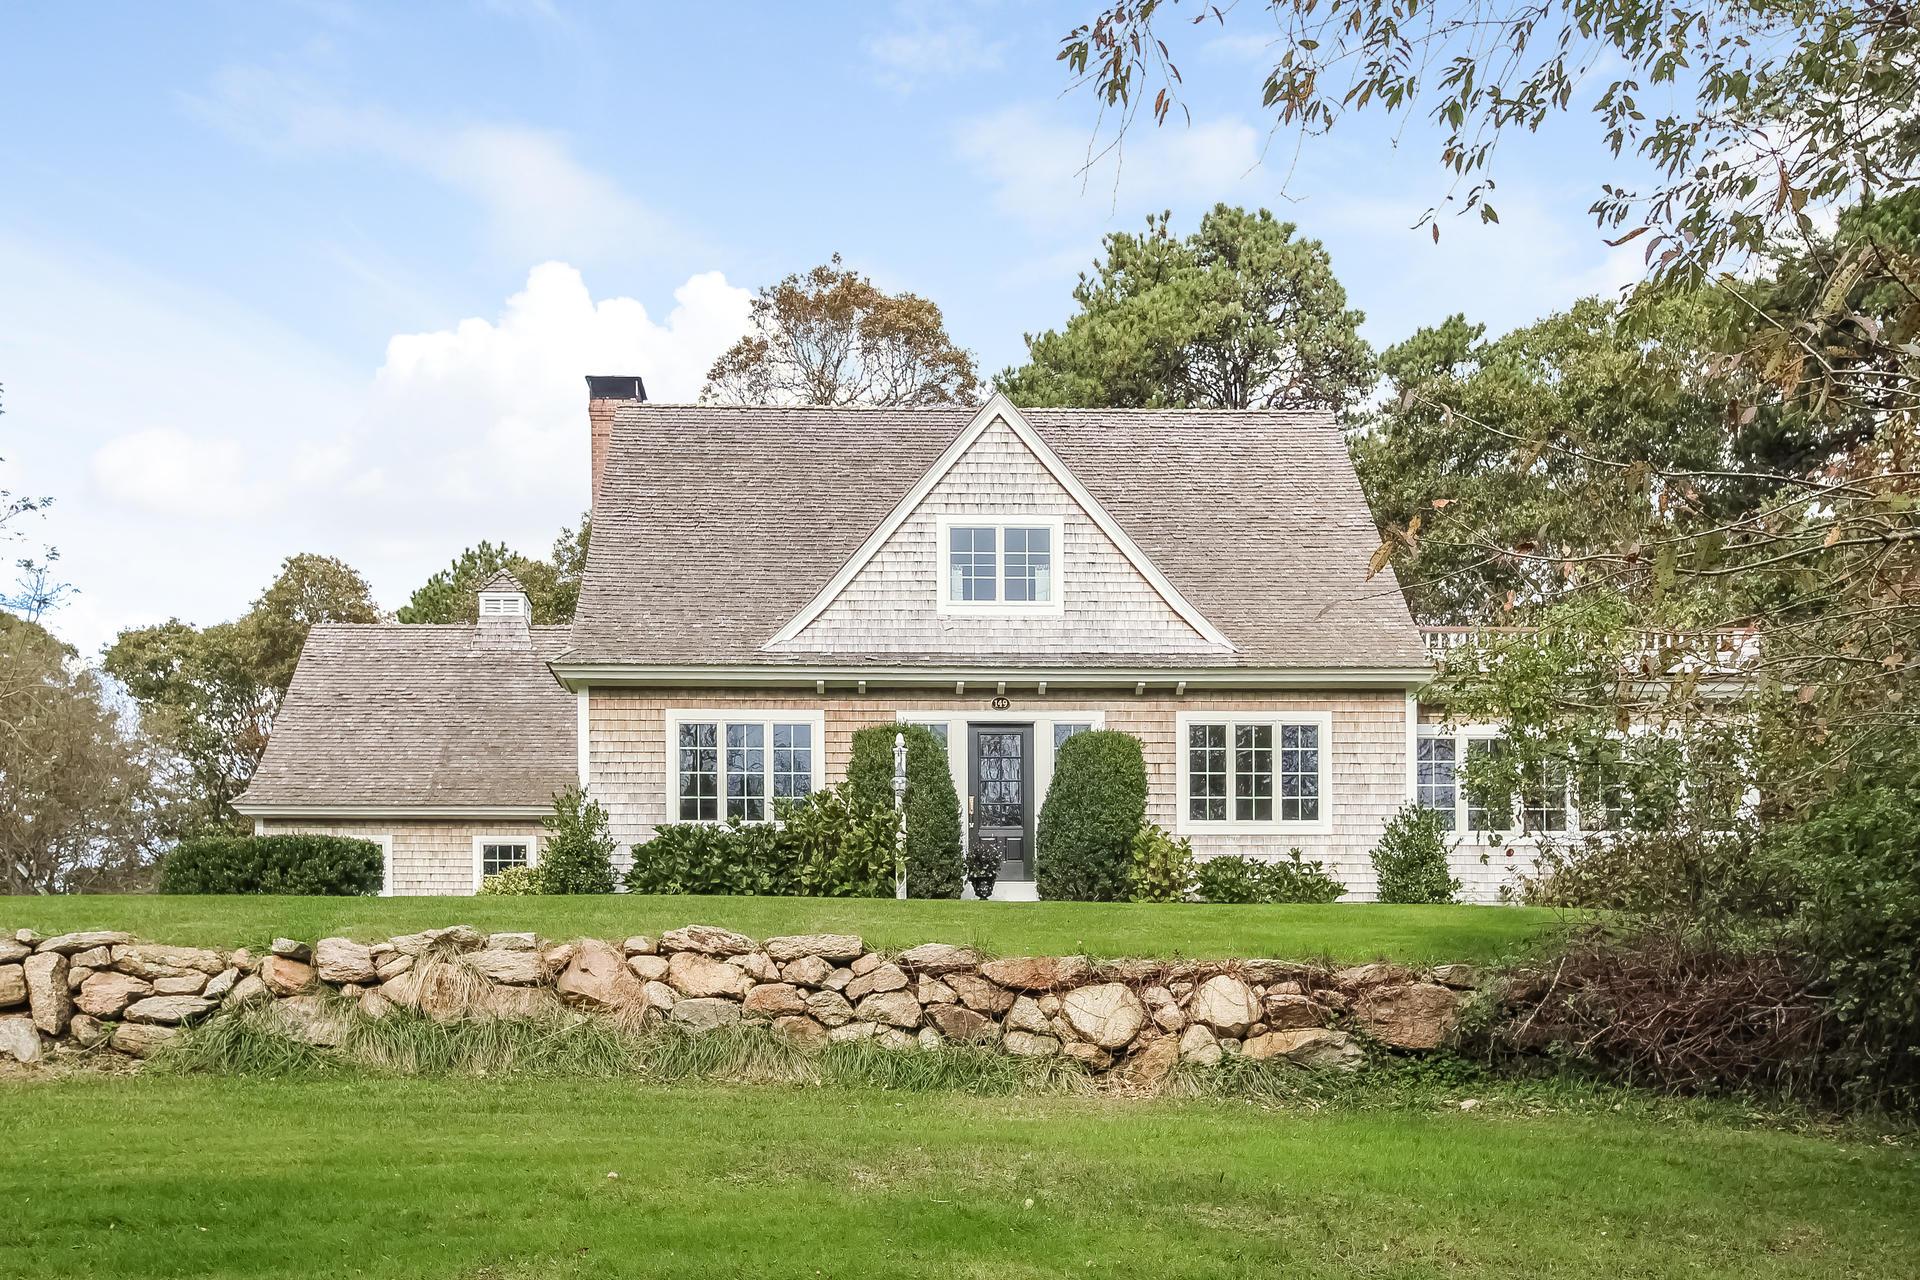 Barnstable Village MA Real Estate Homes for Sale